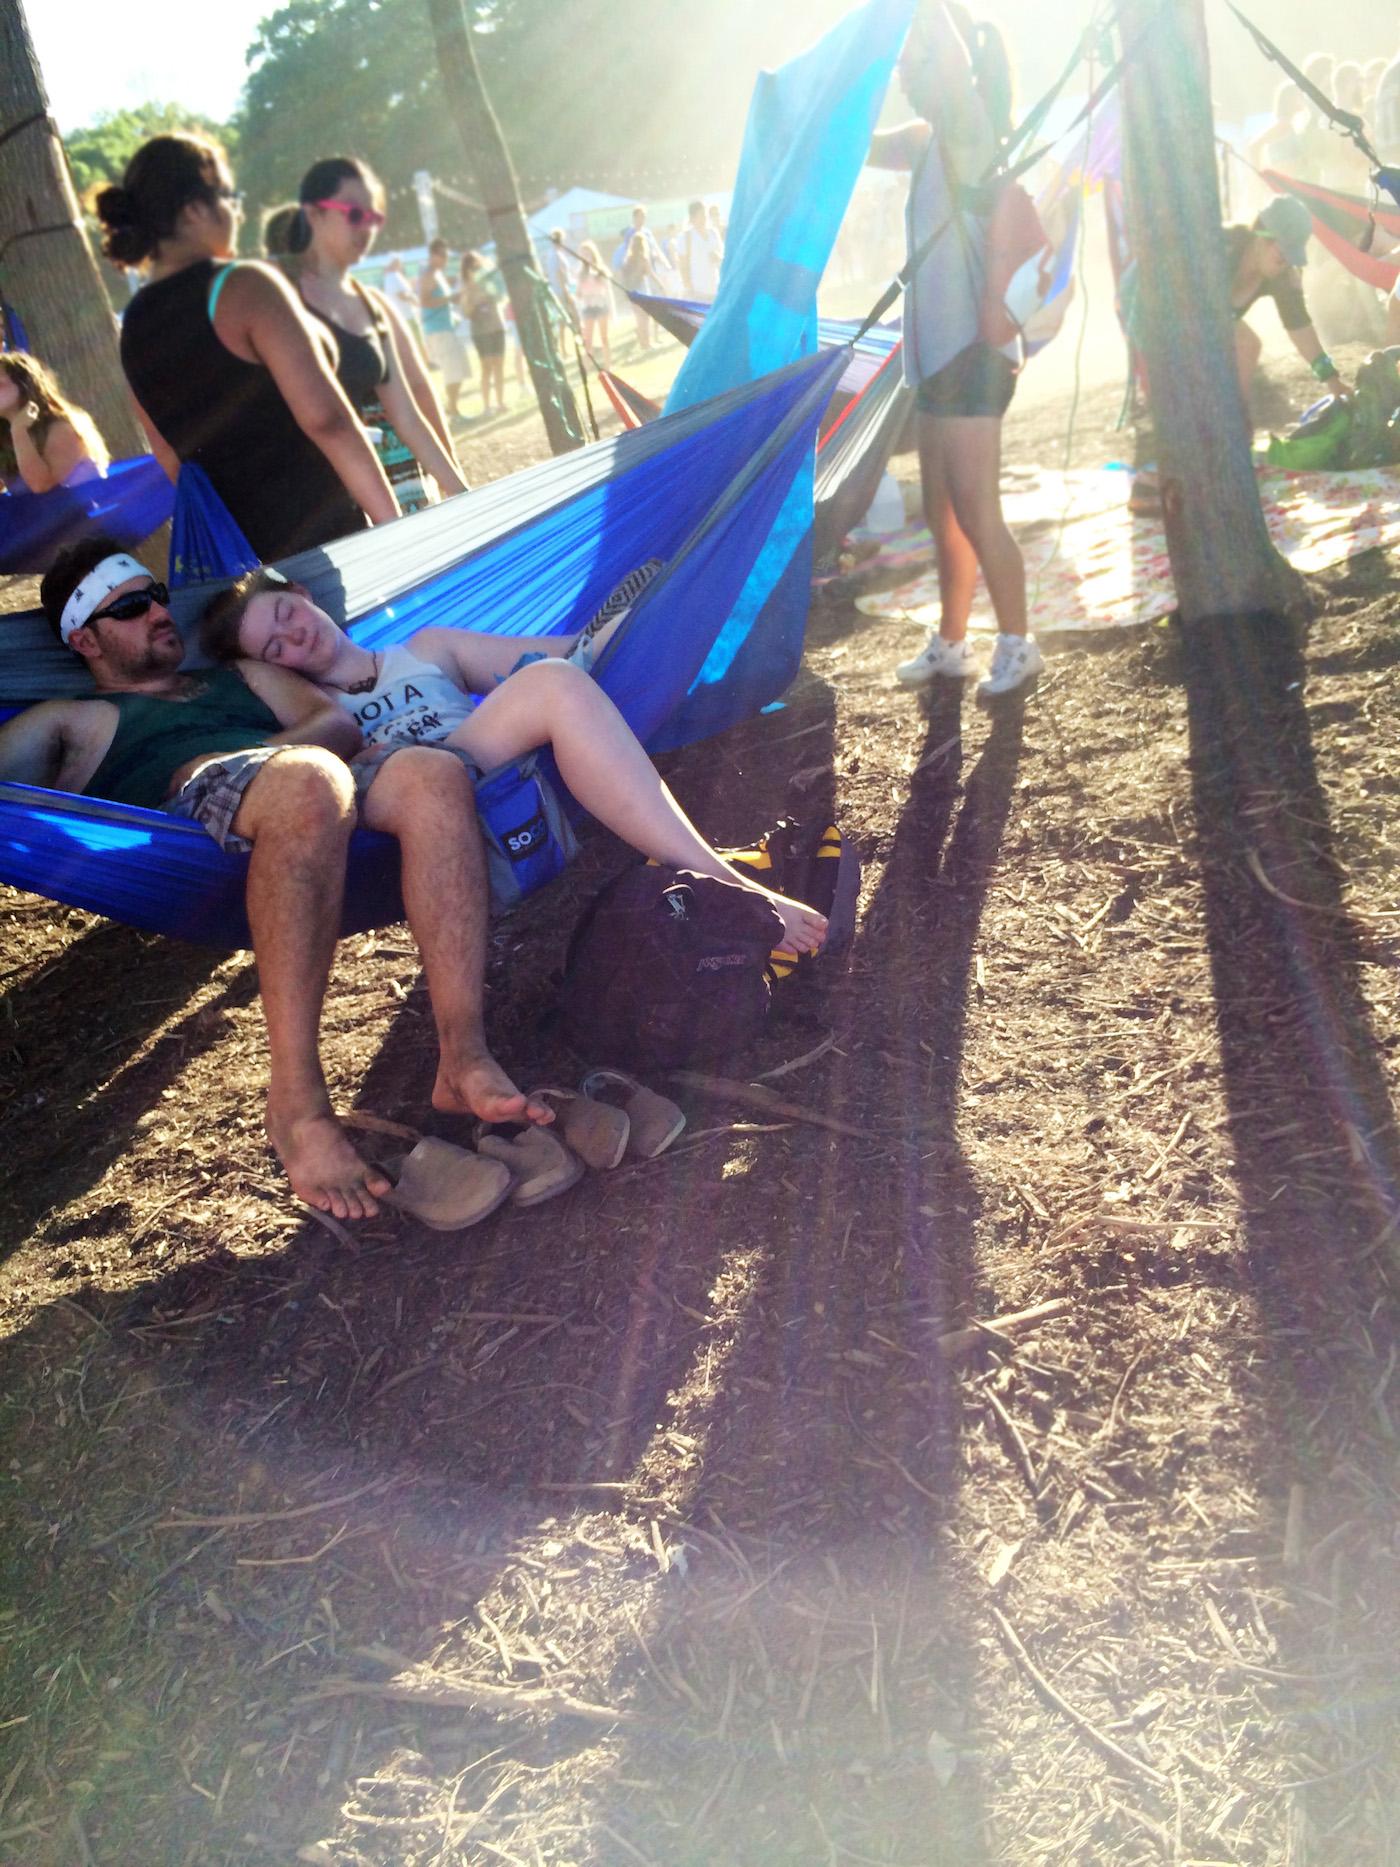 Hammock Hangout at Firefly